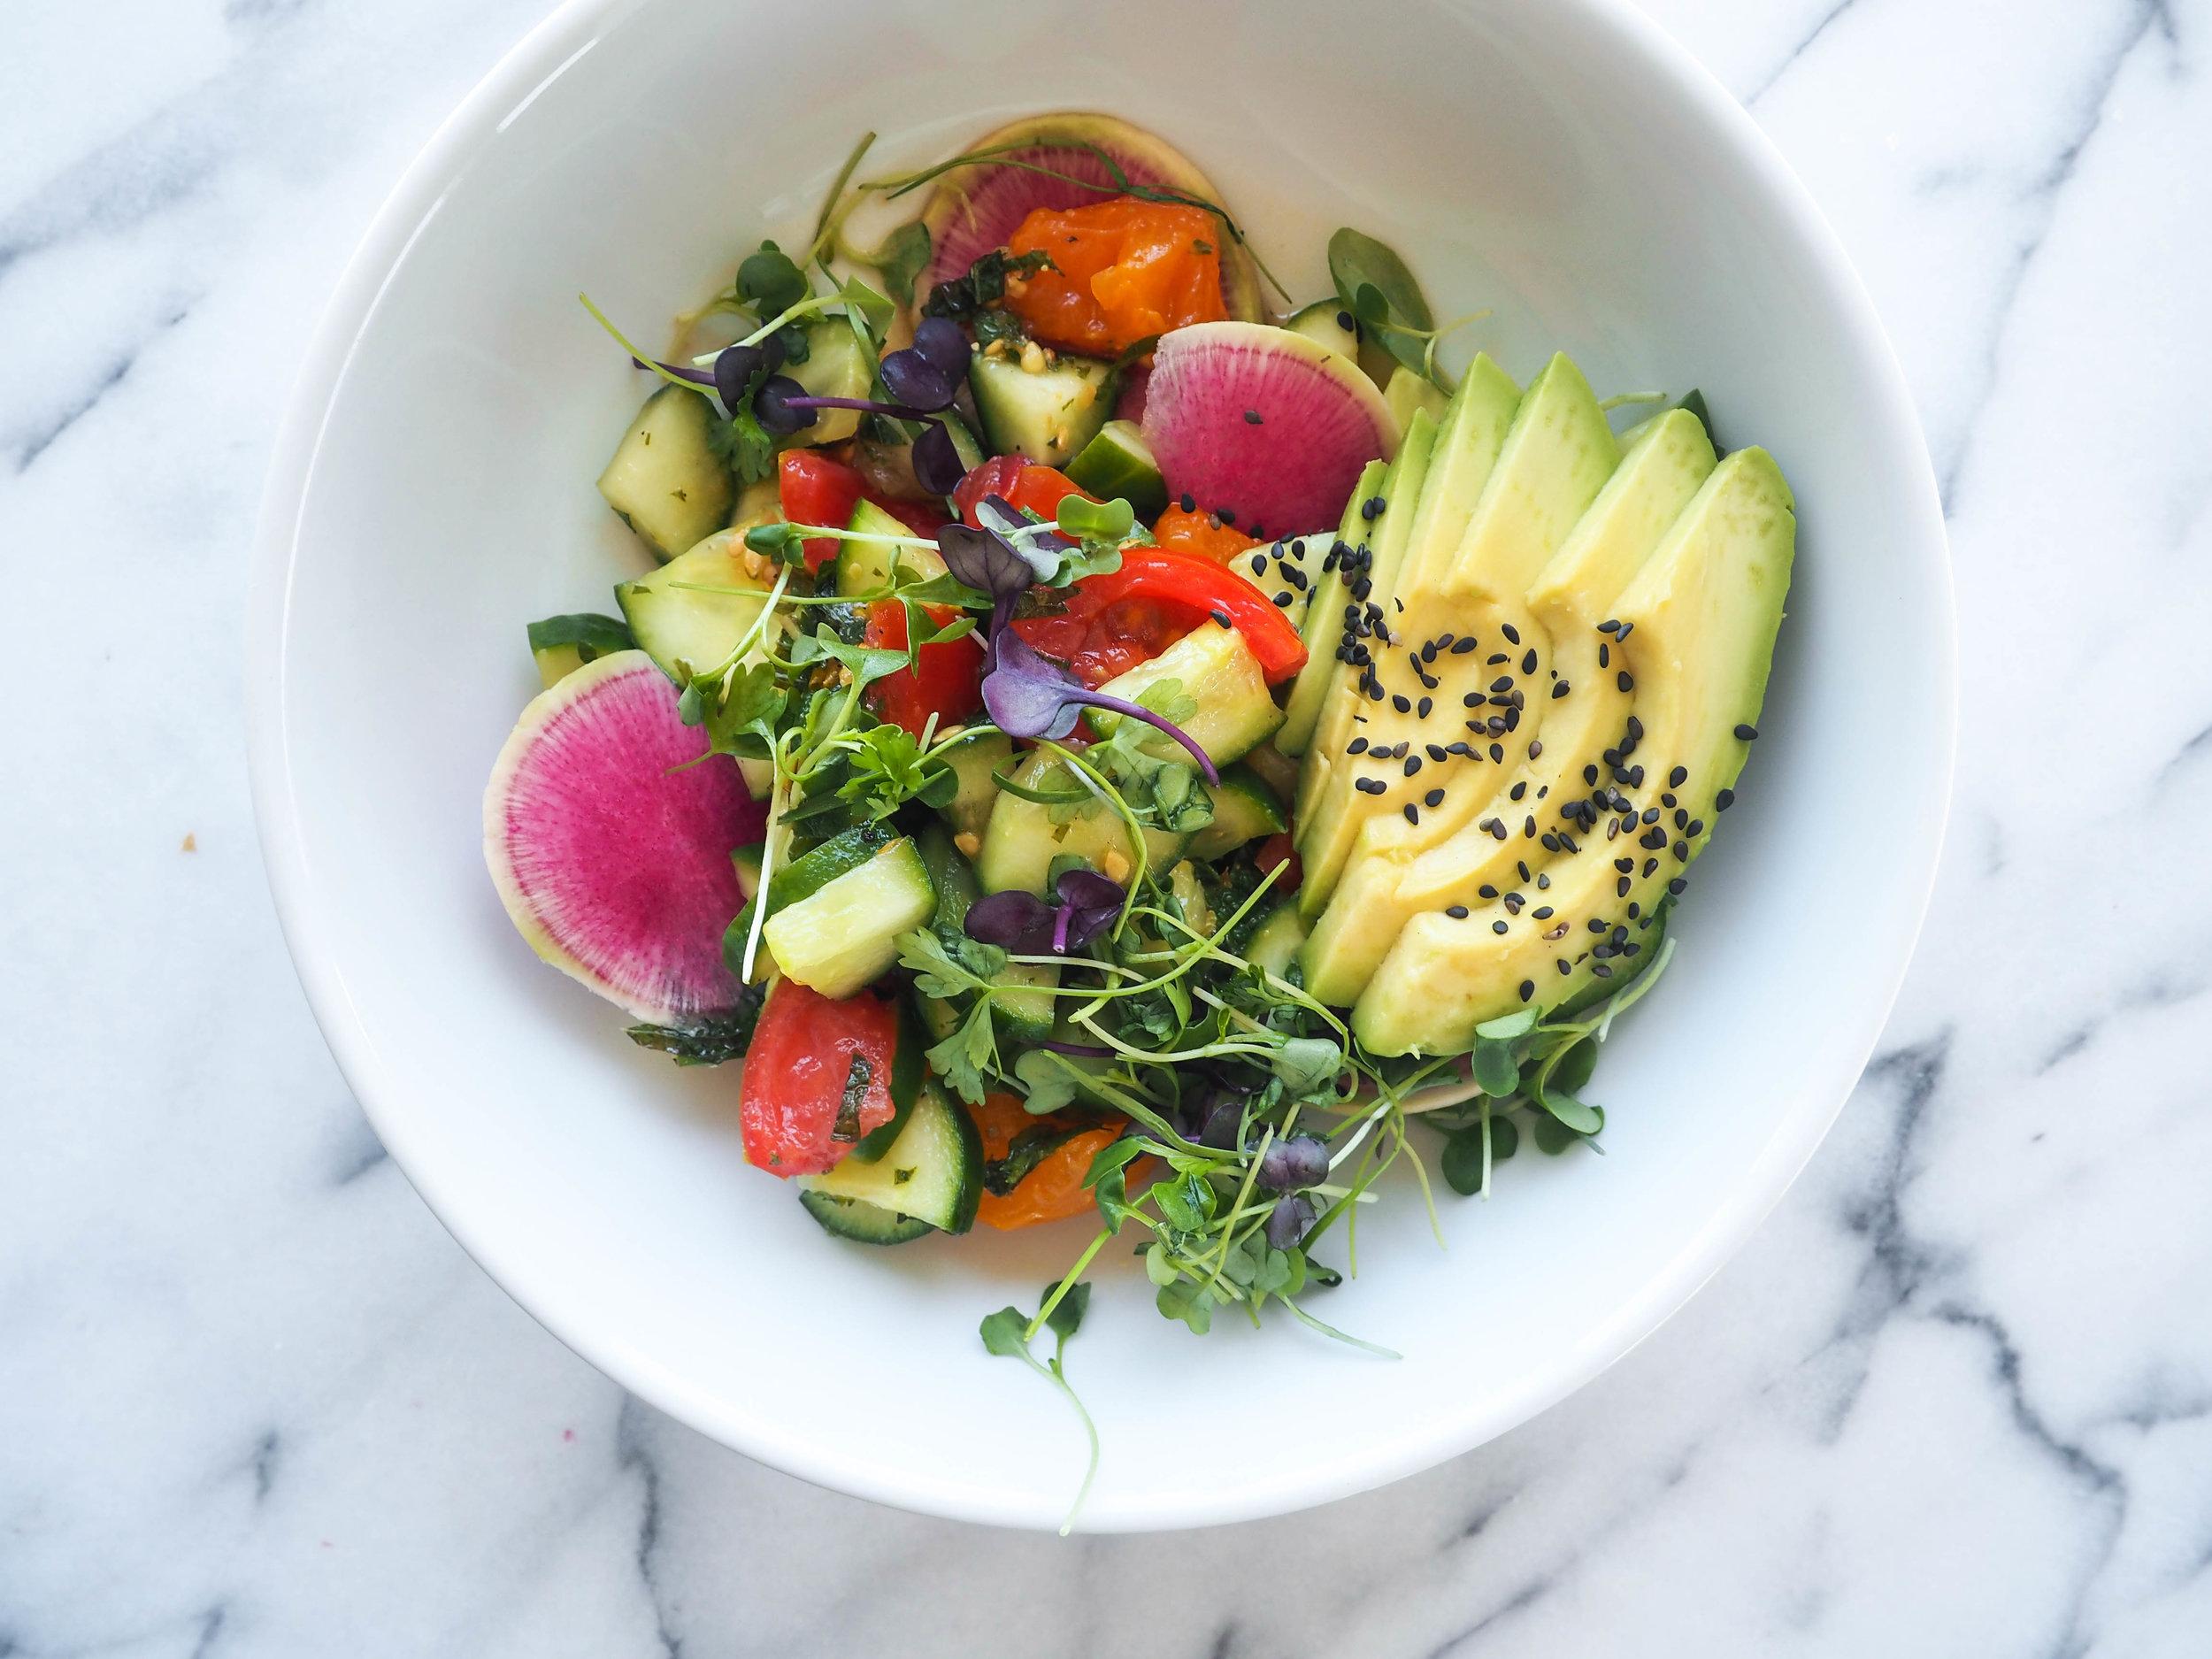 cucumber tomato mont salad with microgreens